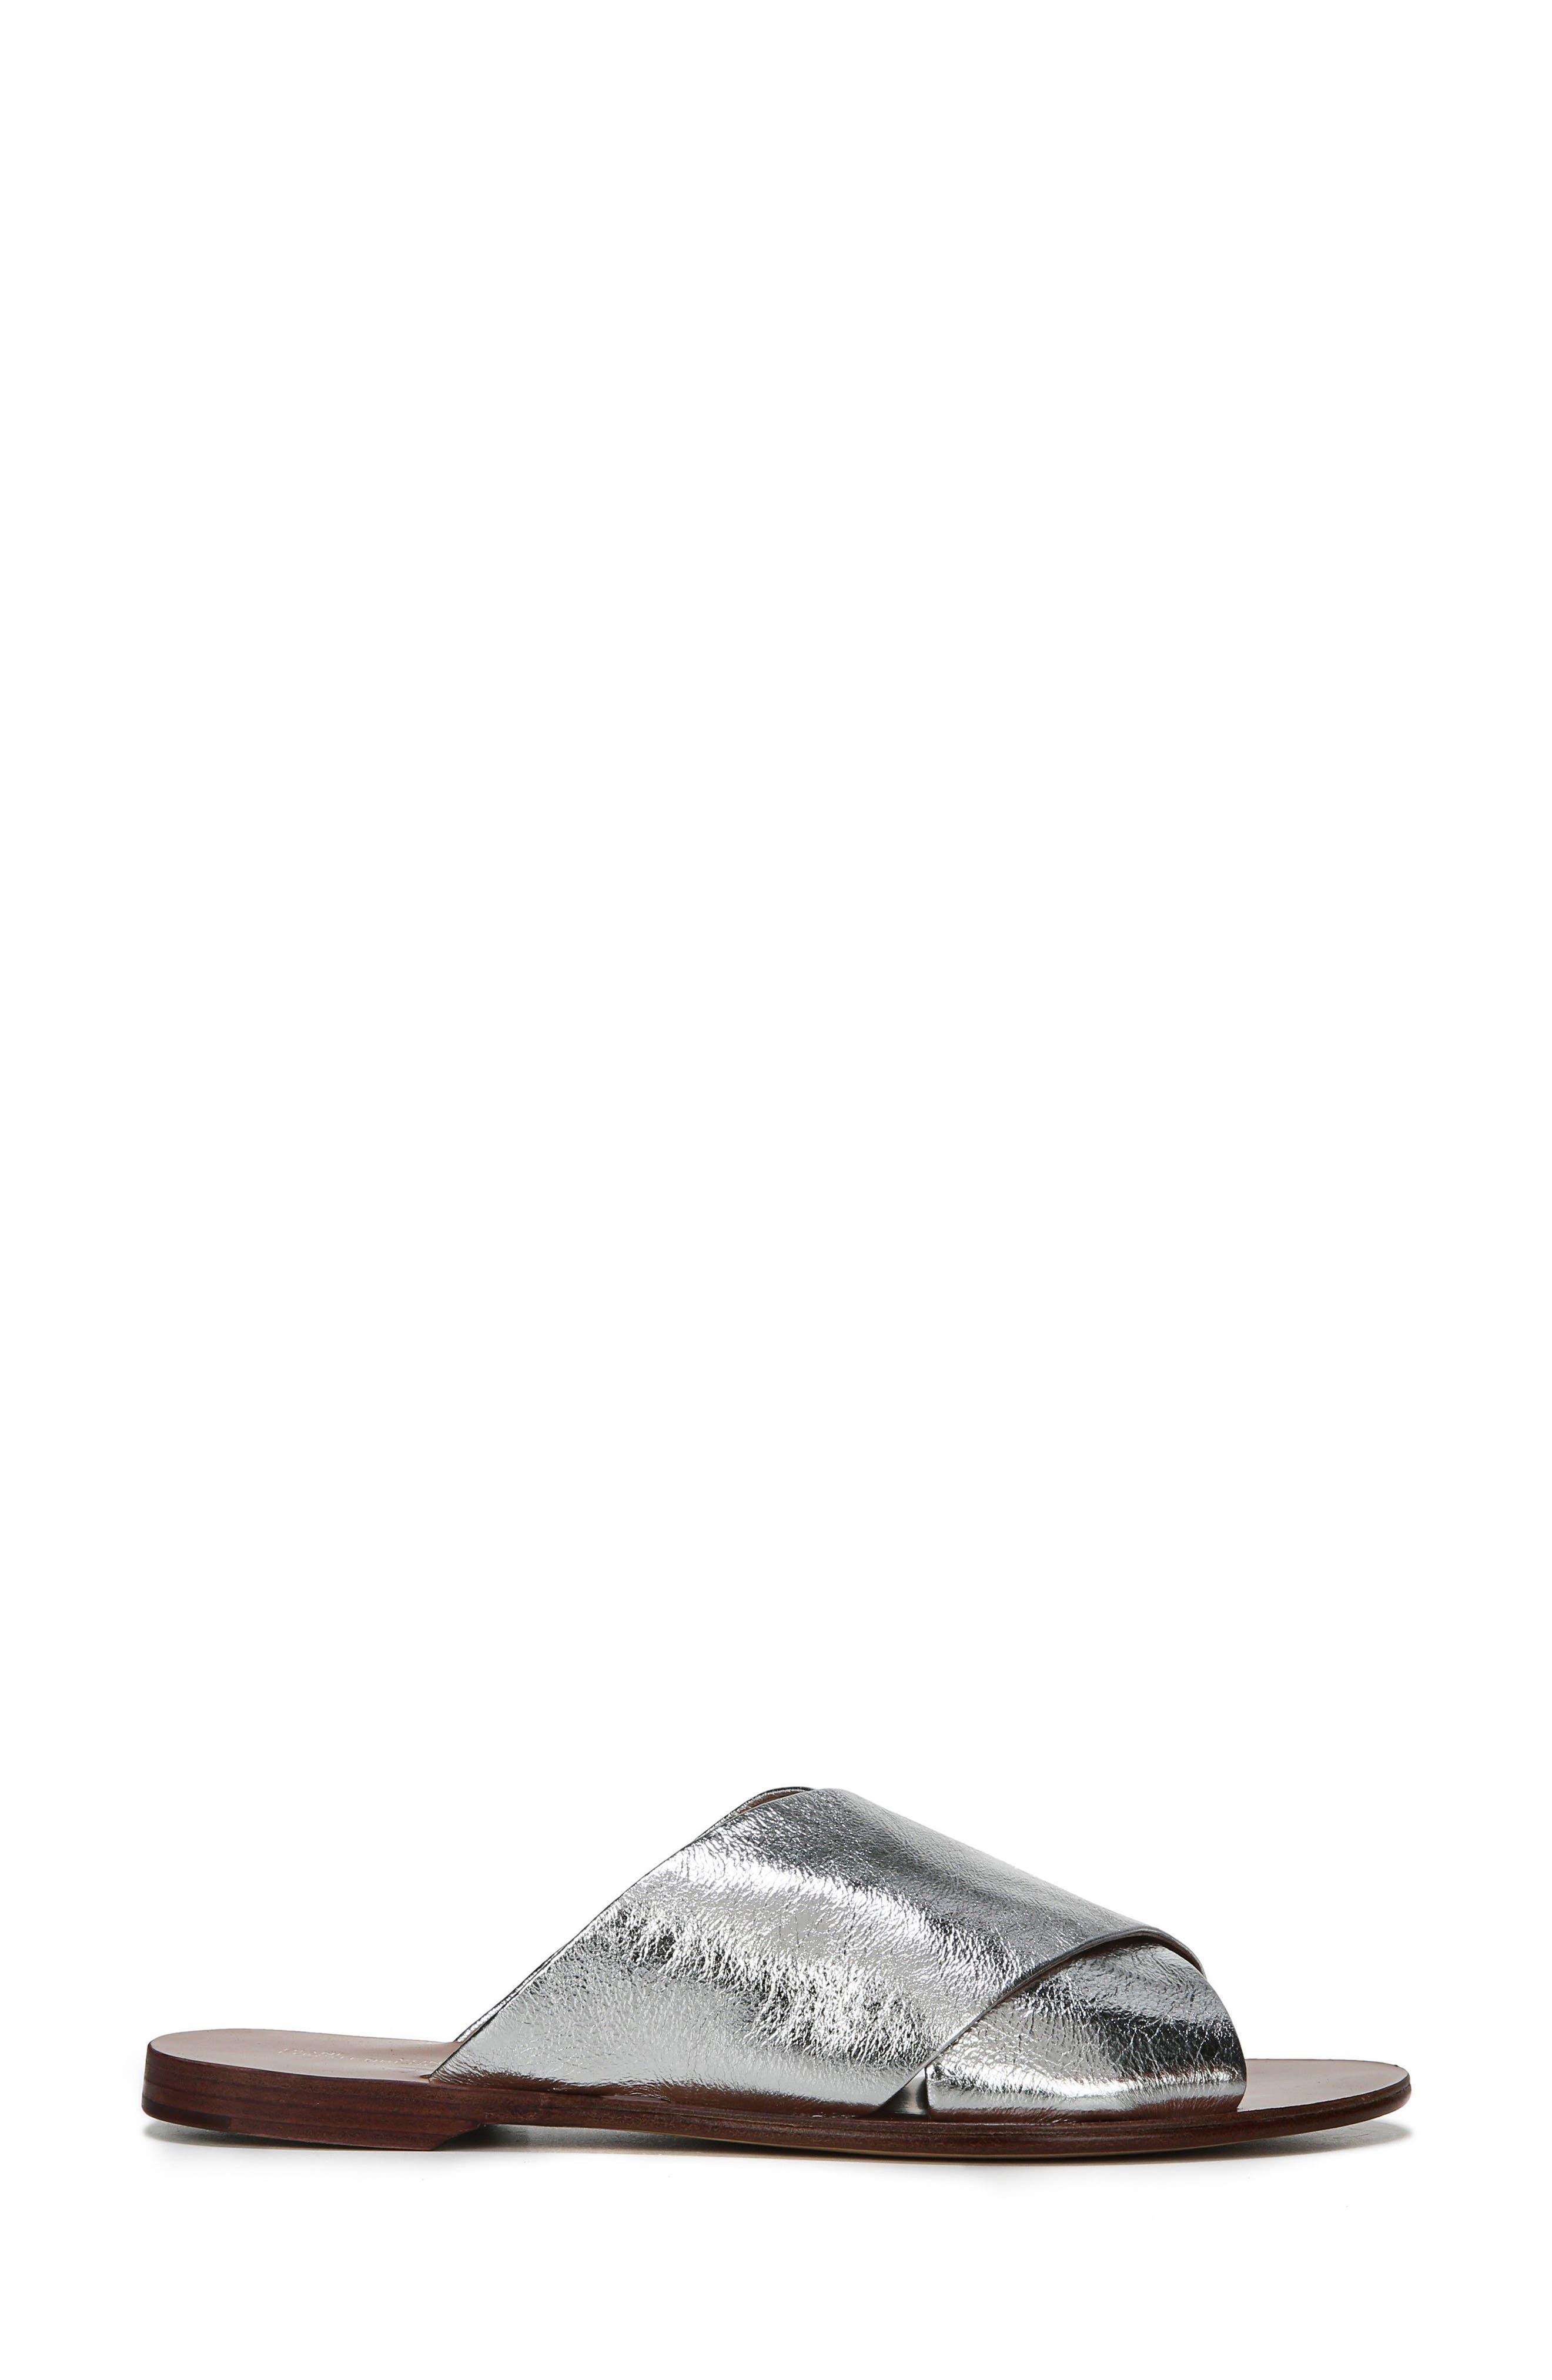 Bailie Sandal,                             Alternate thumbnail 4, color,                             Silver Leather